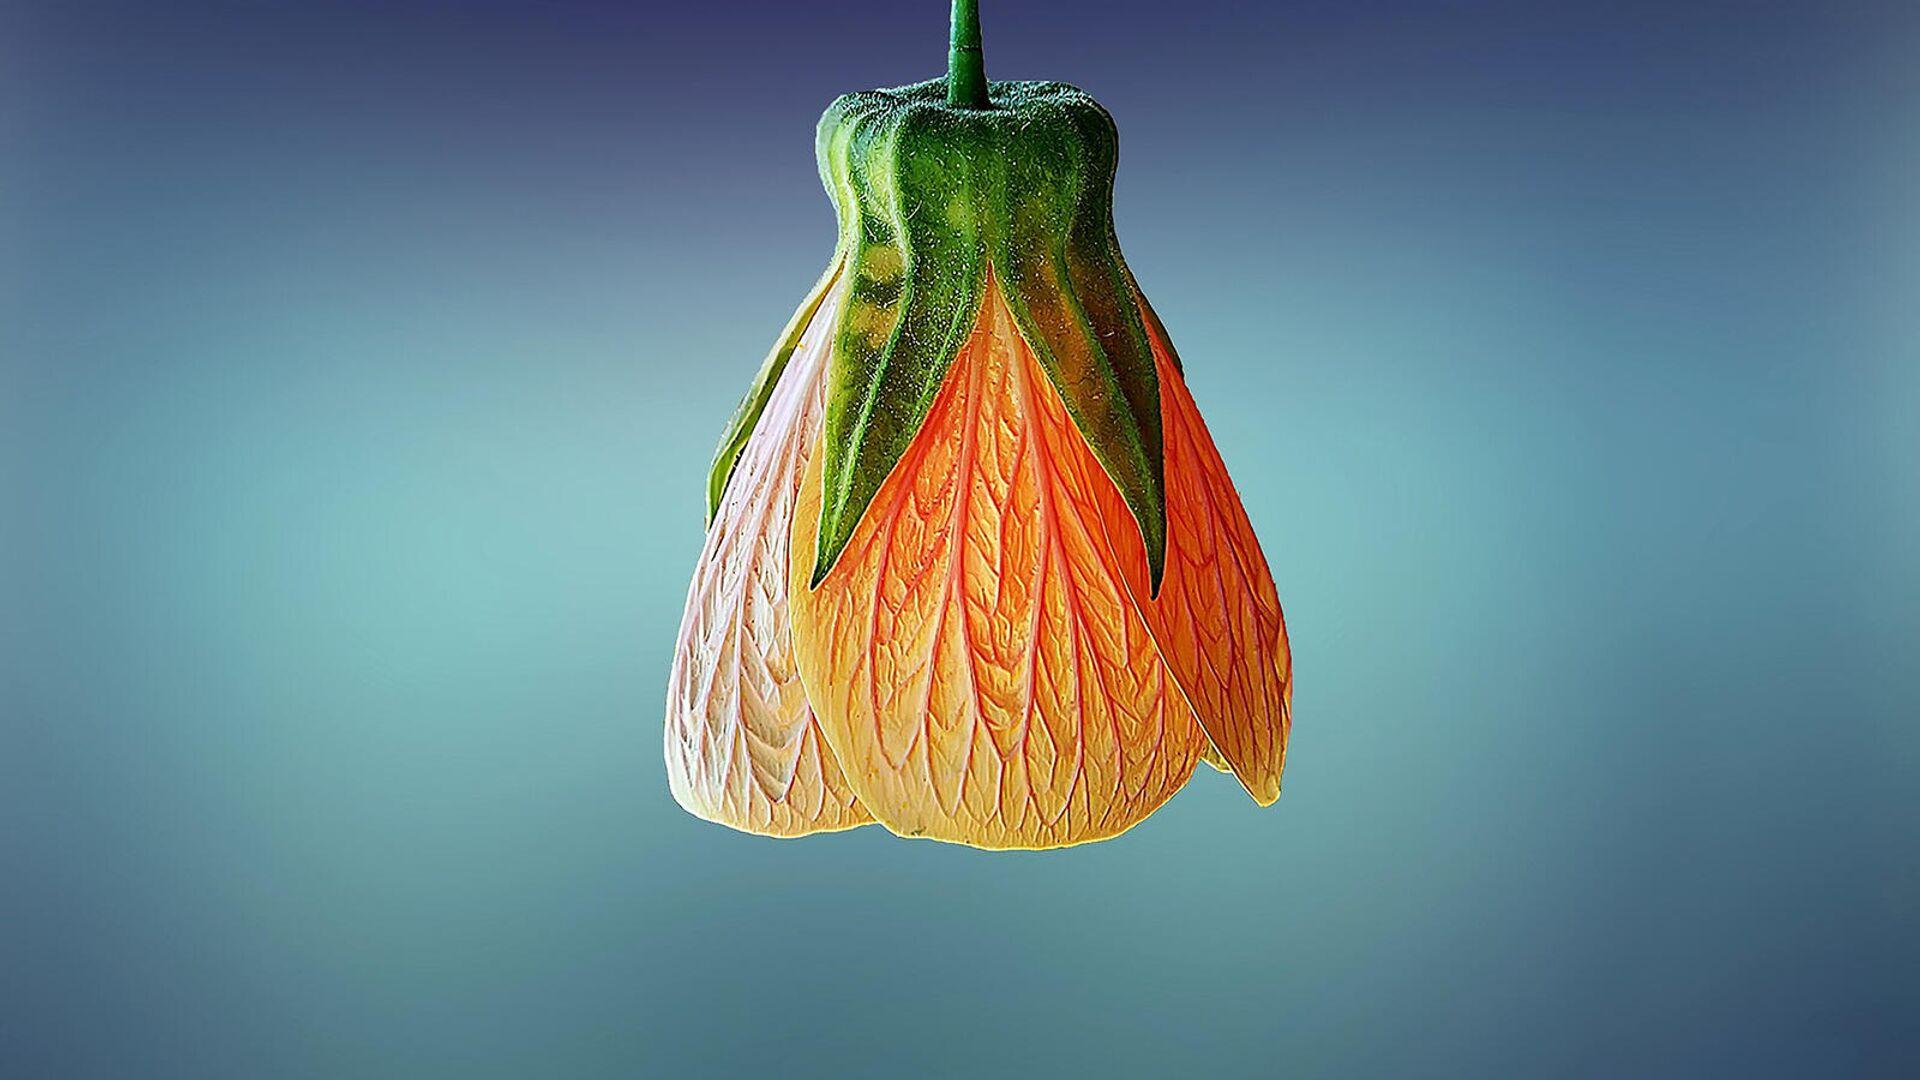 Лампа в виде цветка - Sputnik Армения, 1920, 13.10.2021